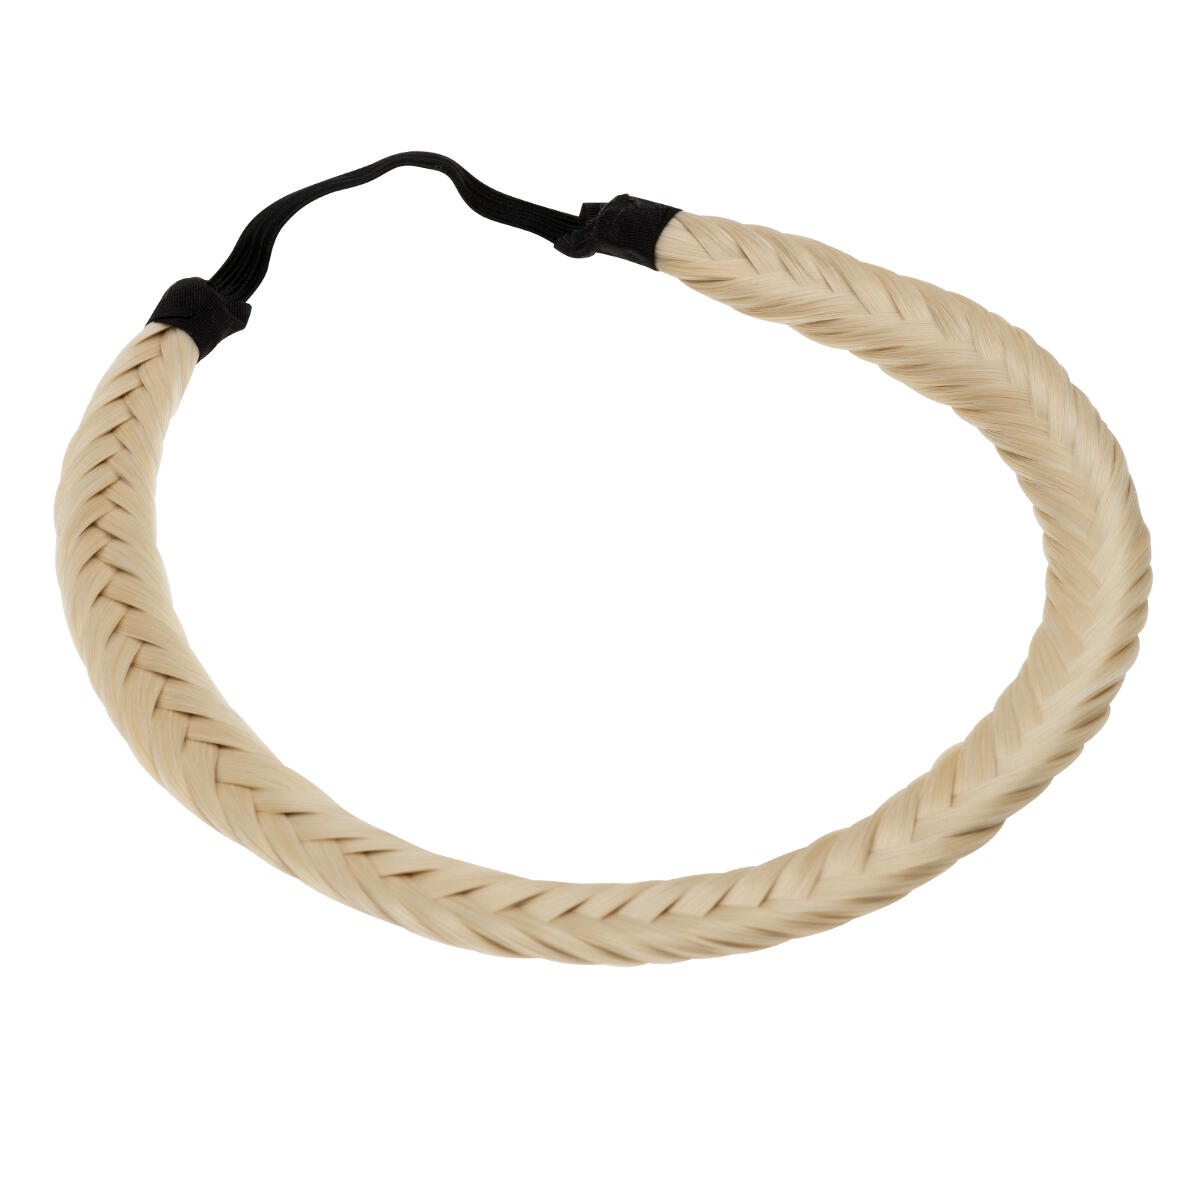 Synthetic Braided Headband 10.8 0 cm